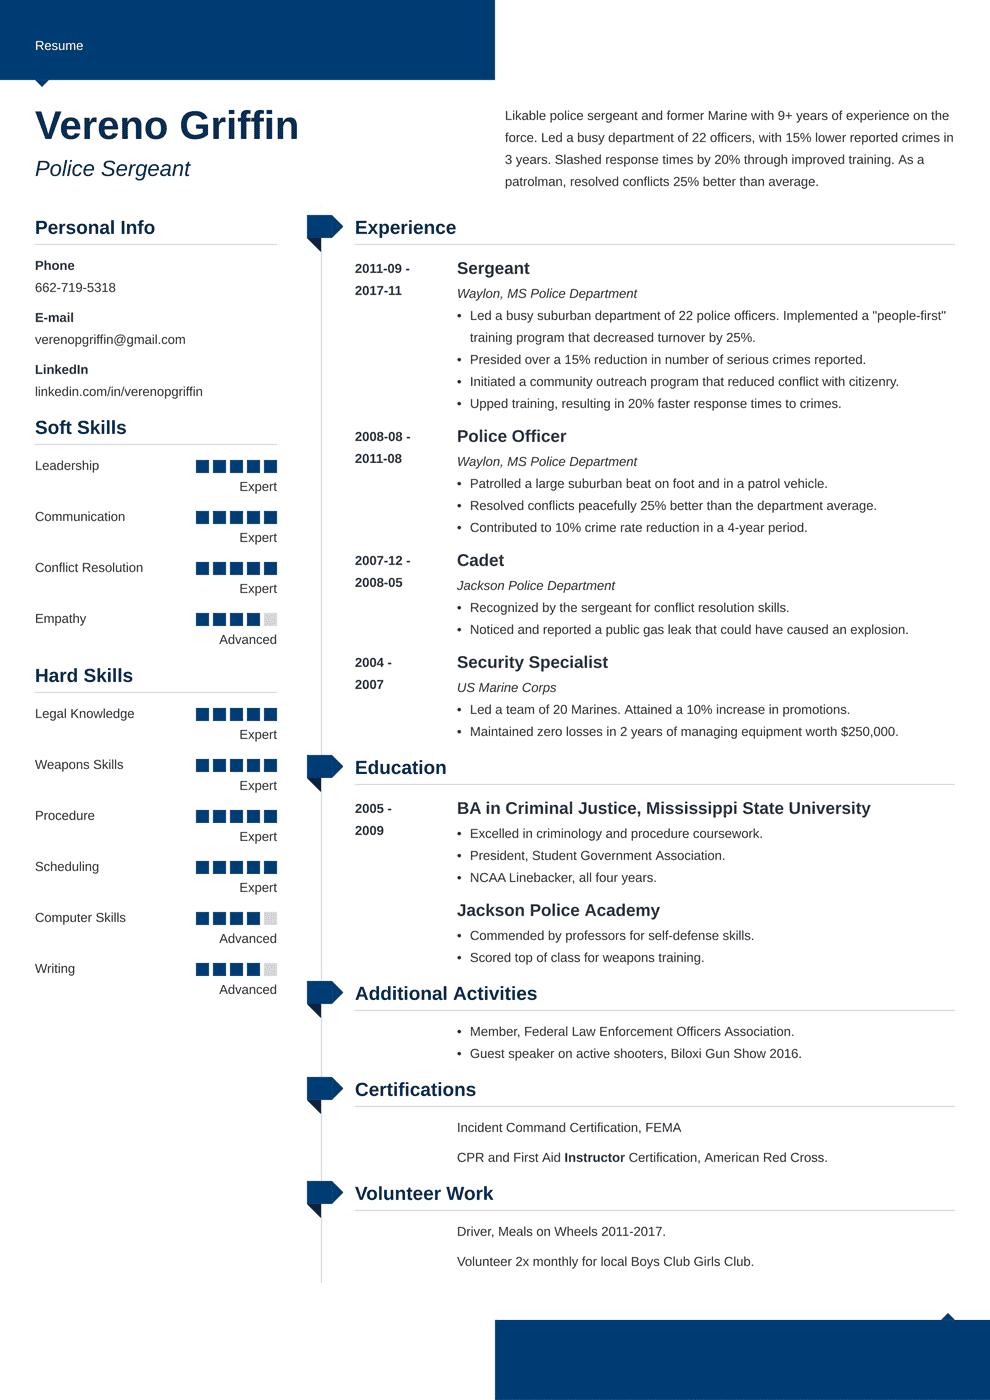 police officer resume template modern in 2020 Resume